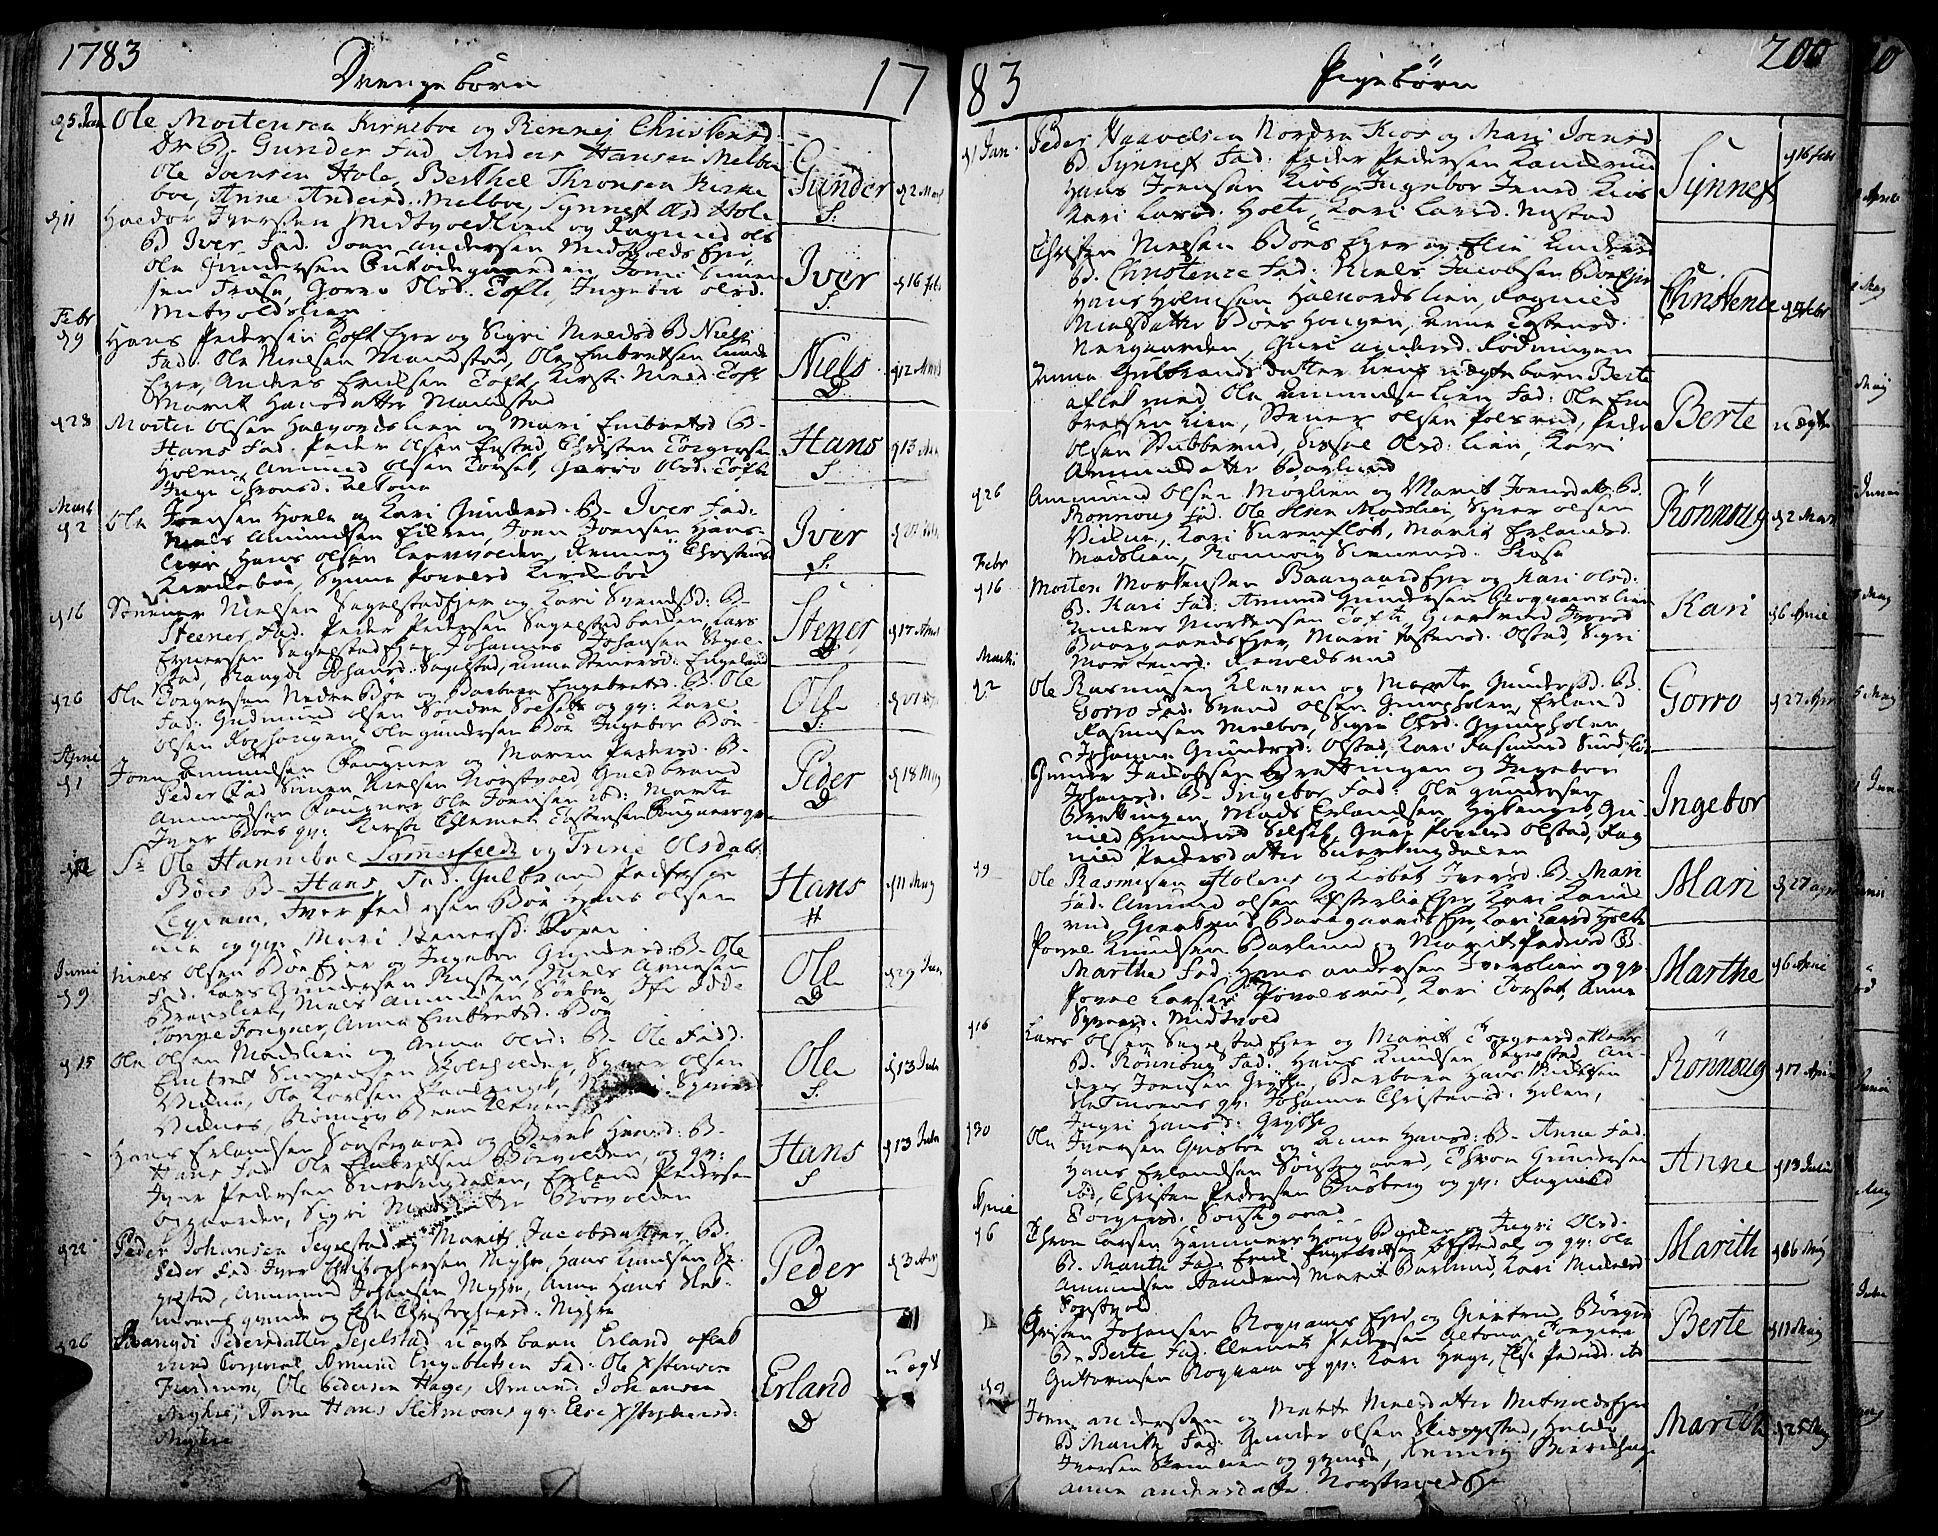 SAH, Gausdal prestekontor, Ministerialbok nr. 3, 1758-1809, s. 200